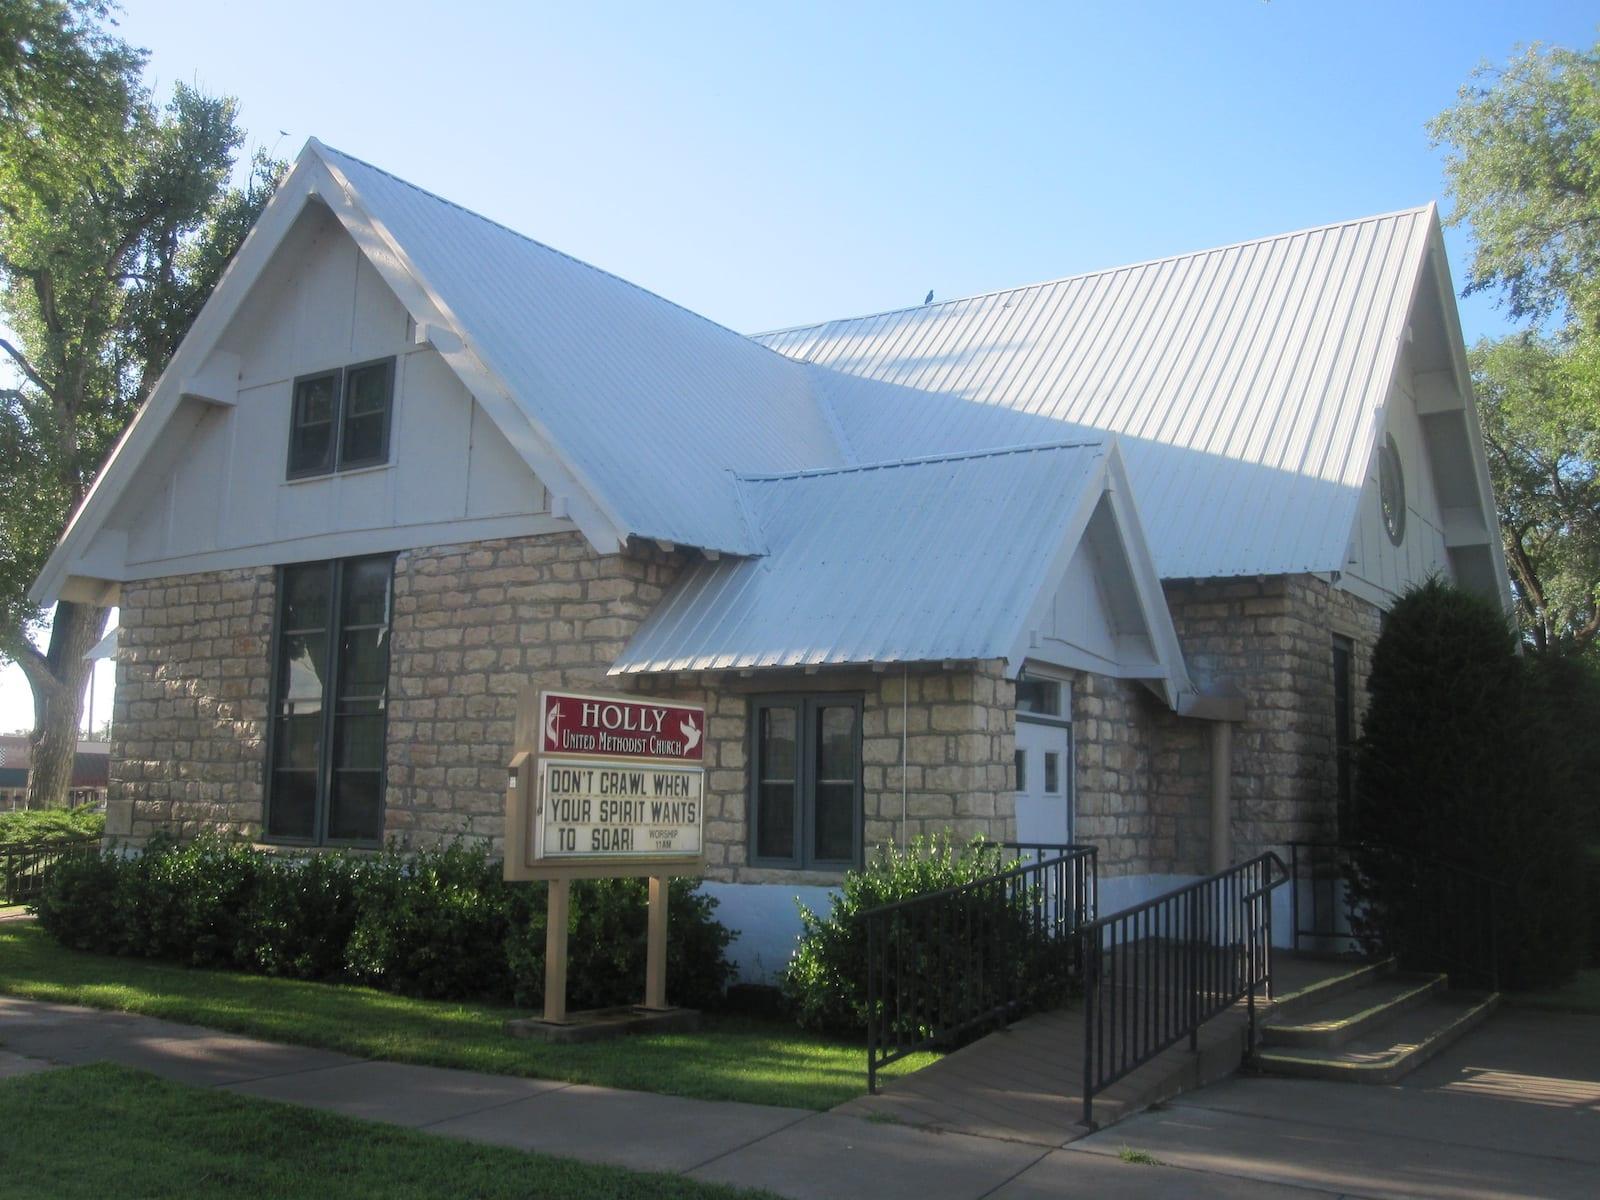 Holly CO First United Methodist Church